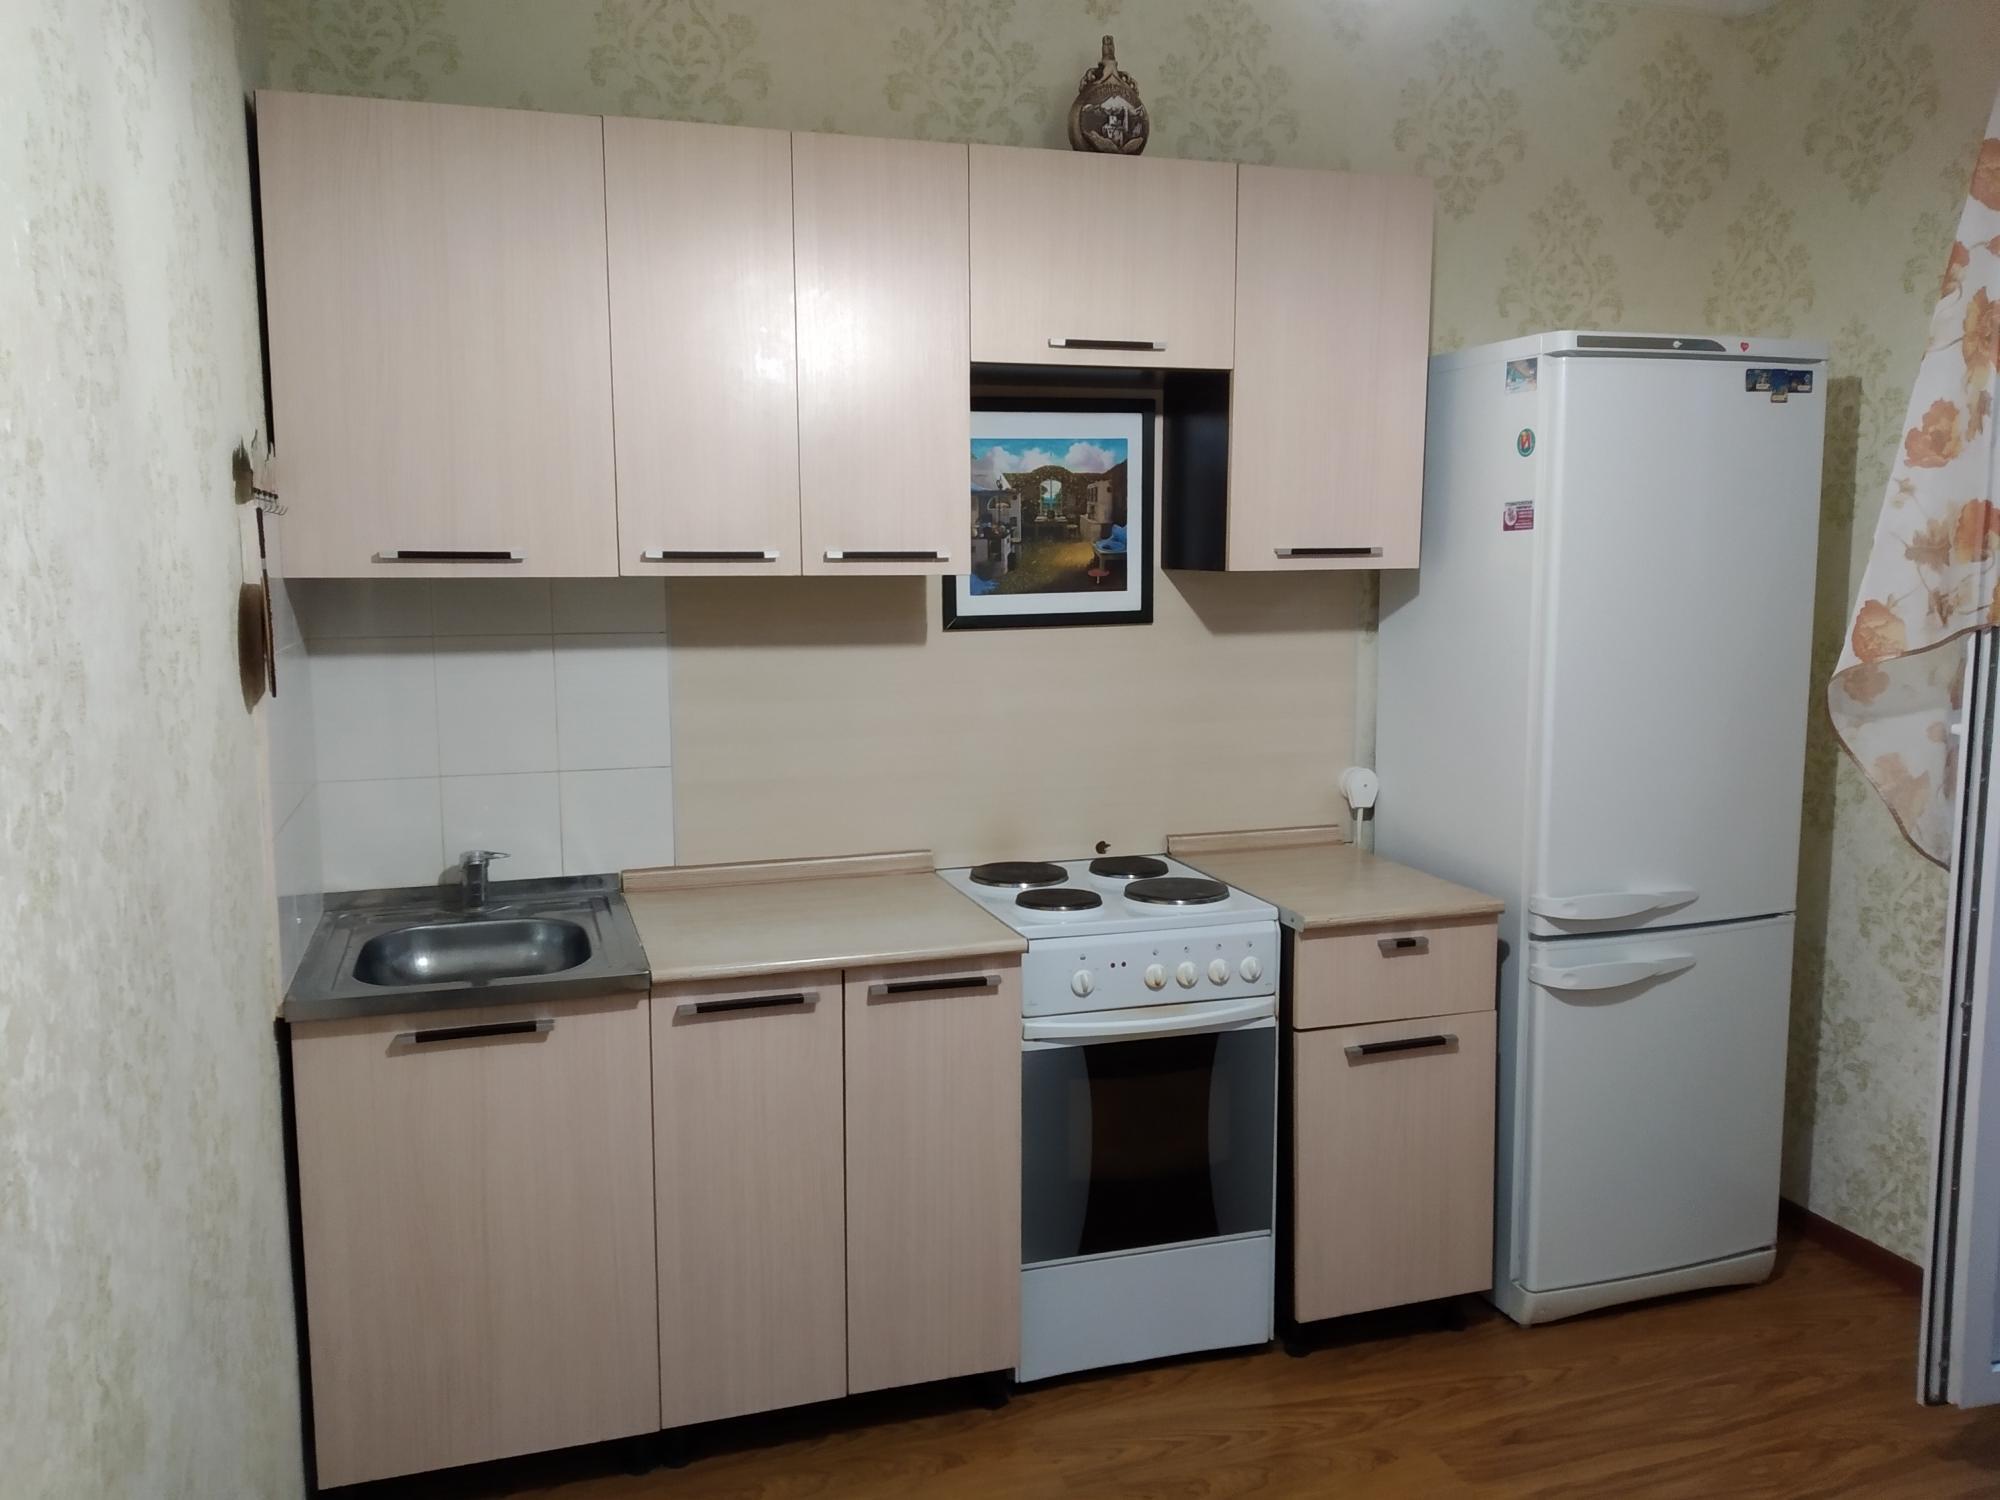 Квартира, 2 комнаты, 65 м² 89031834137 купить 1